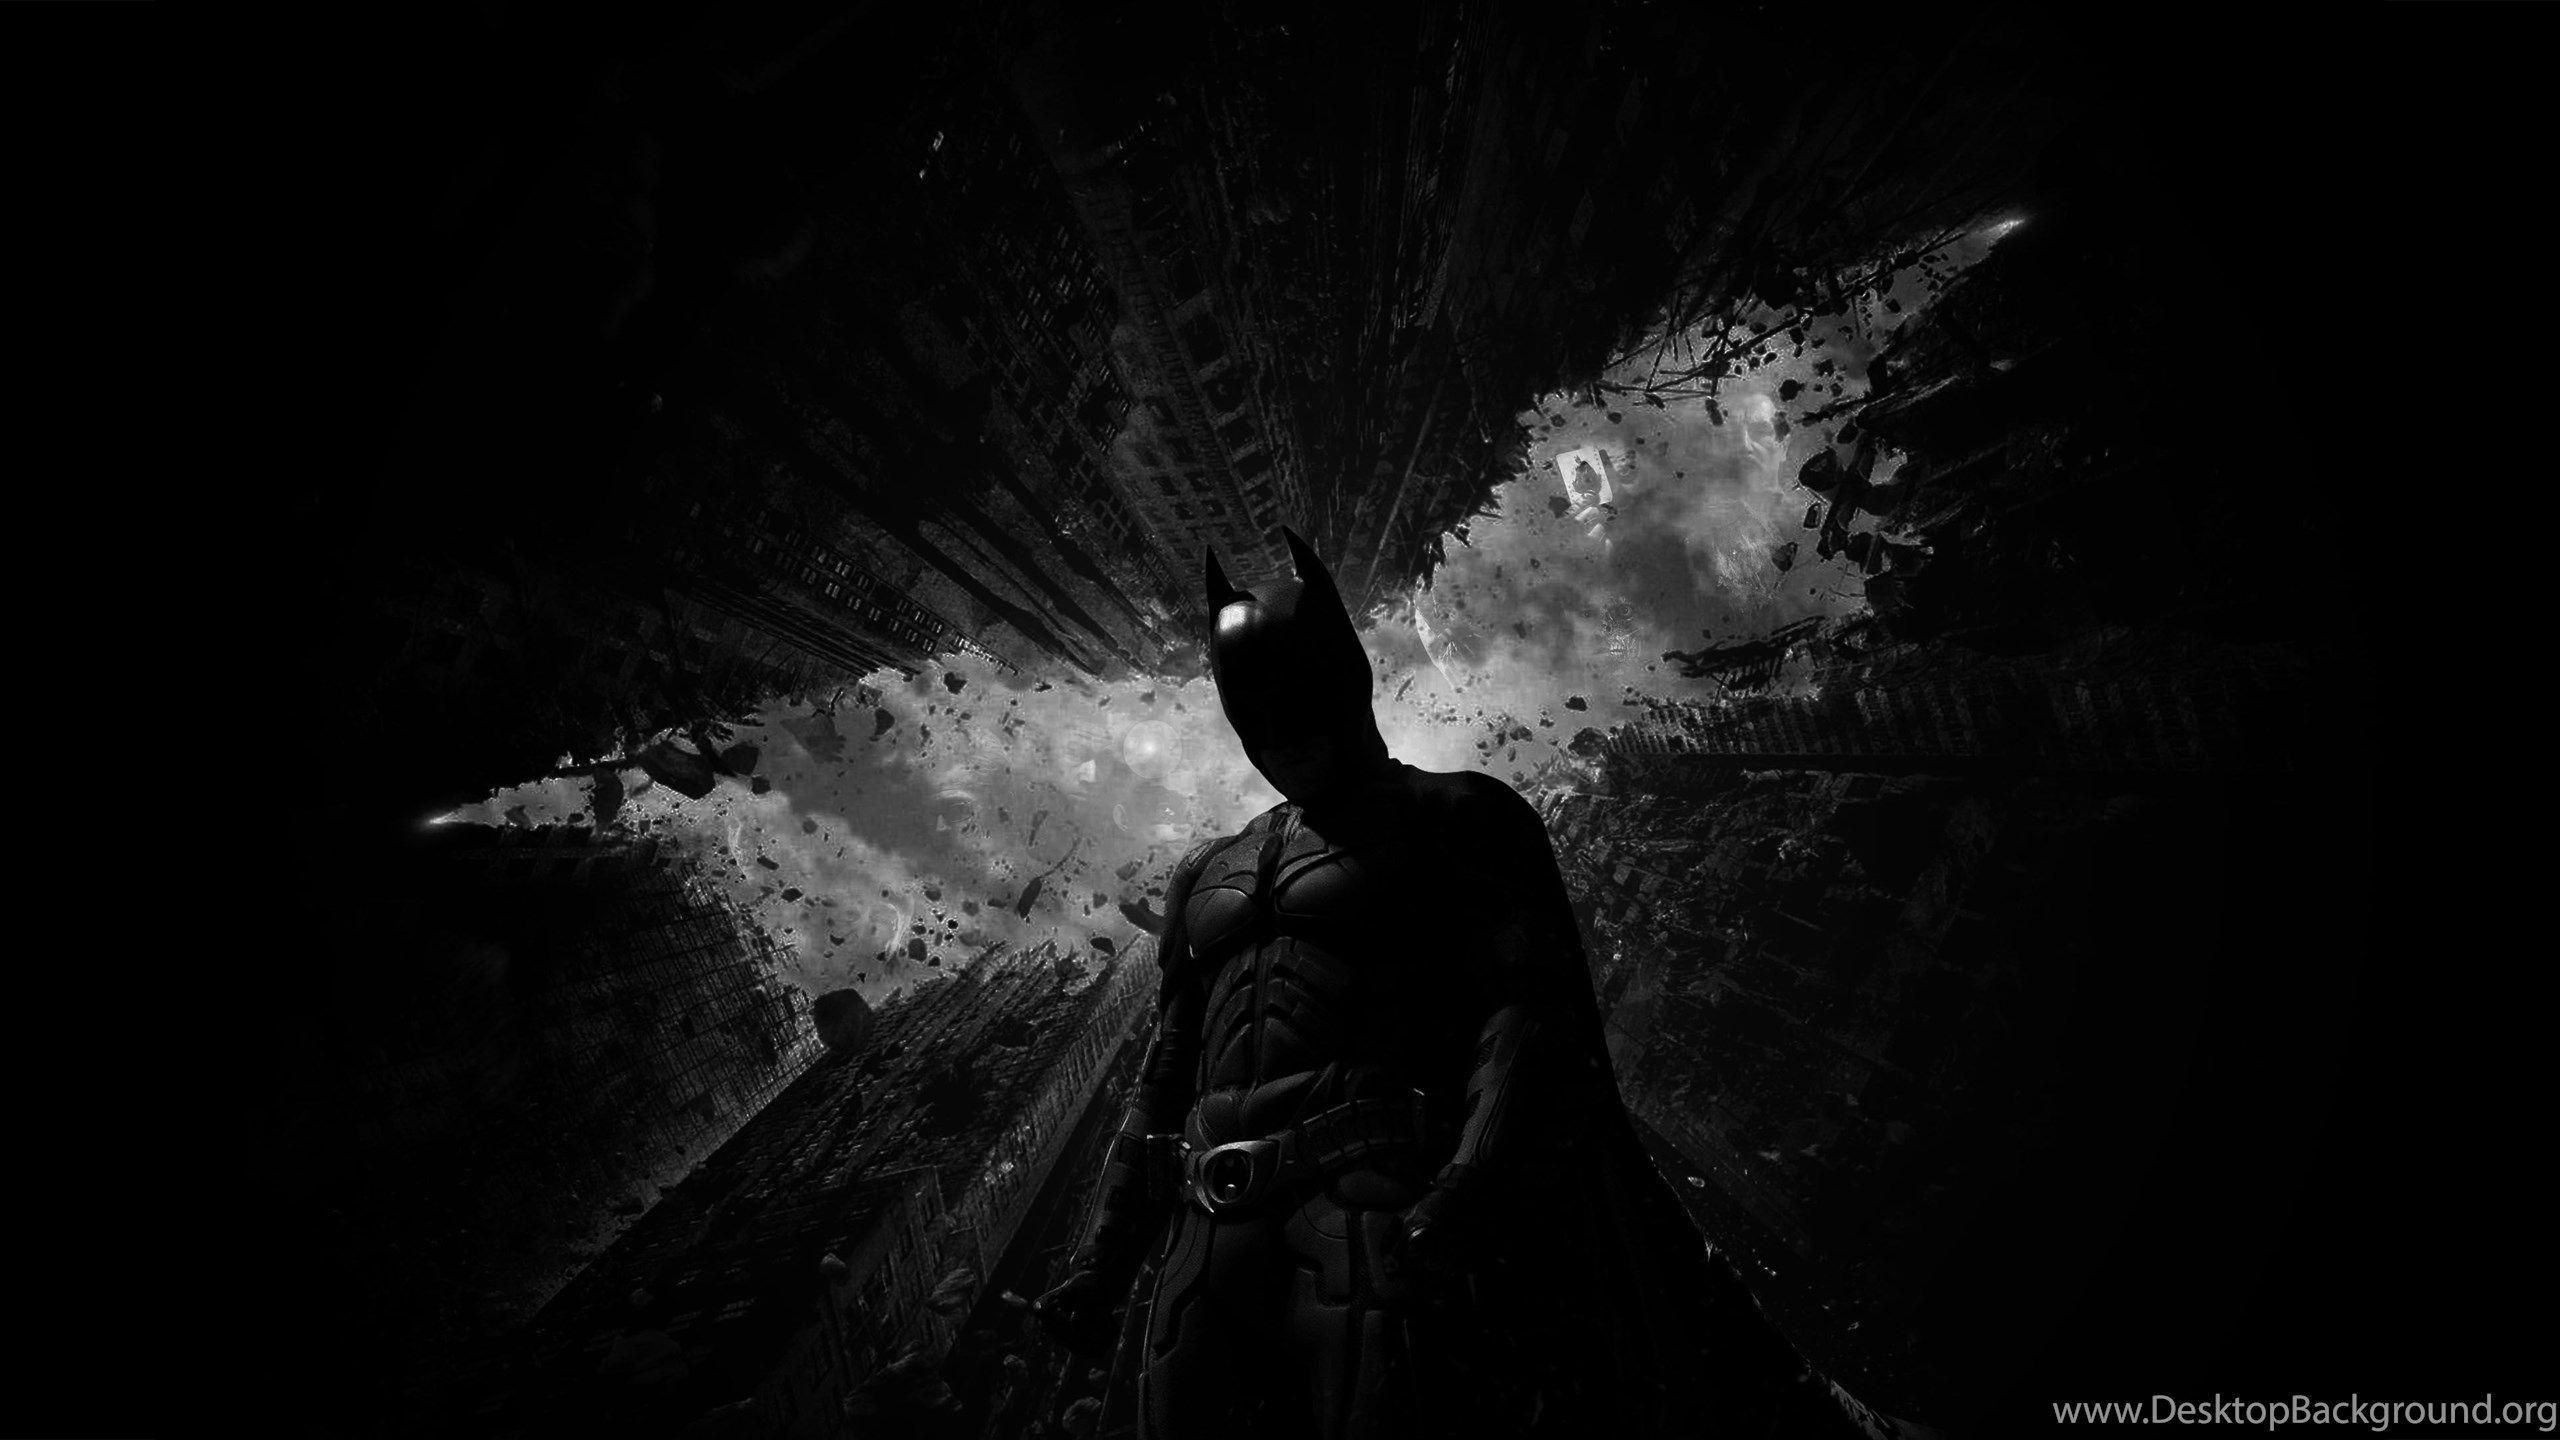 Wallpapers Batman The Dark Knight Rises